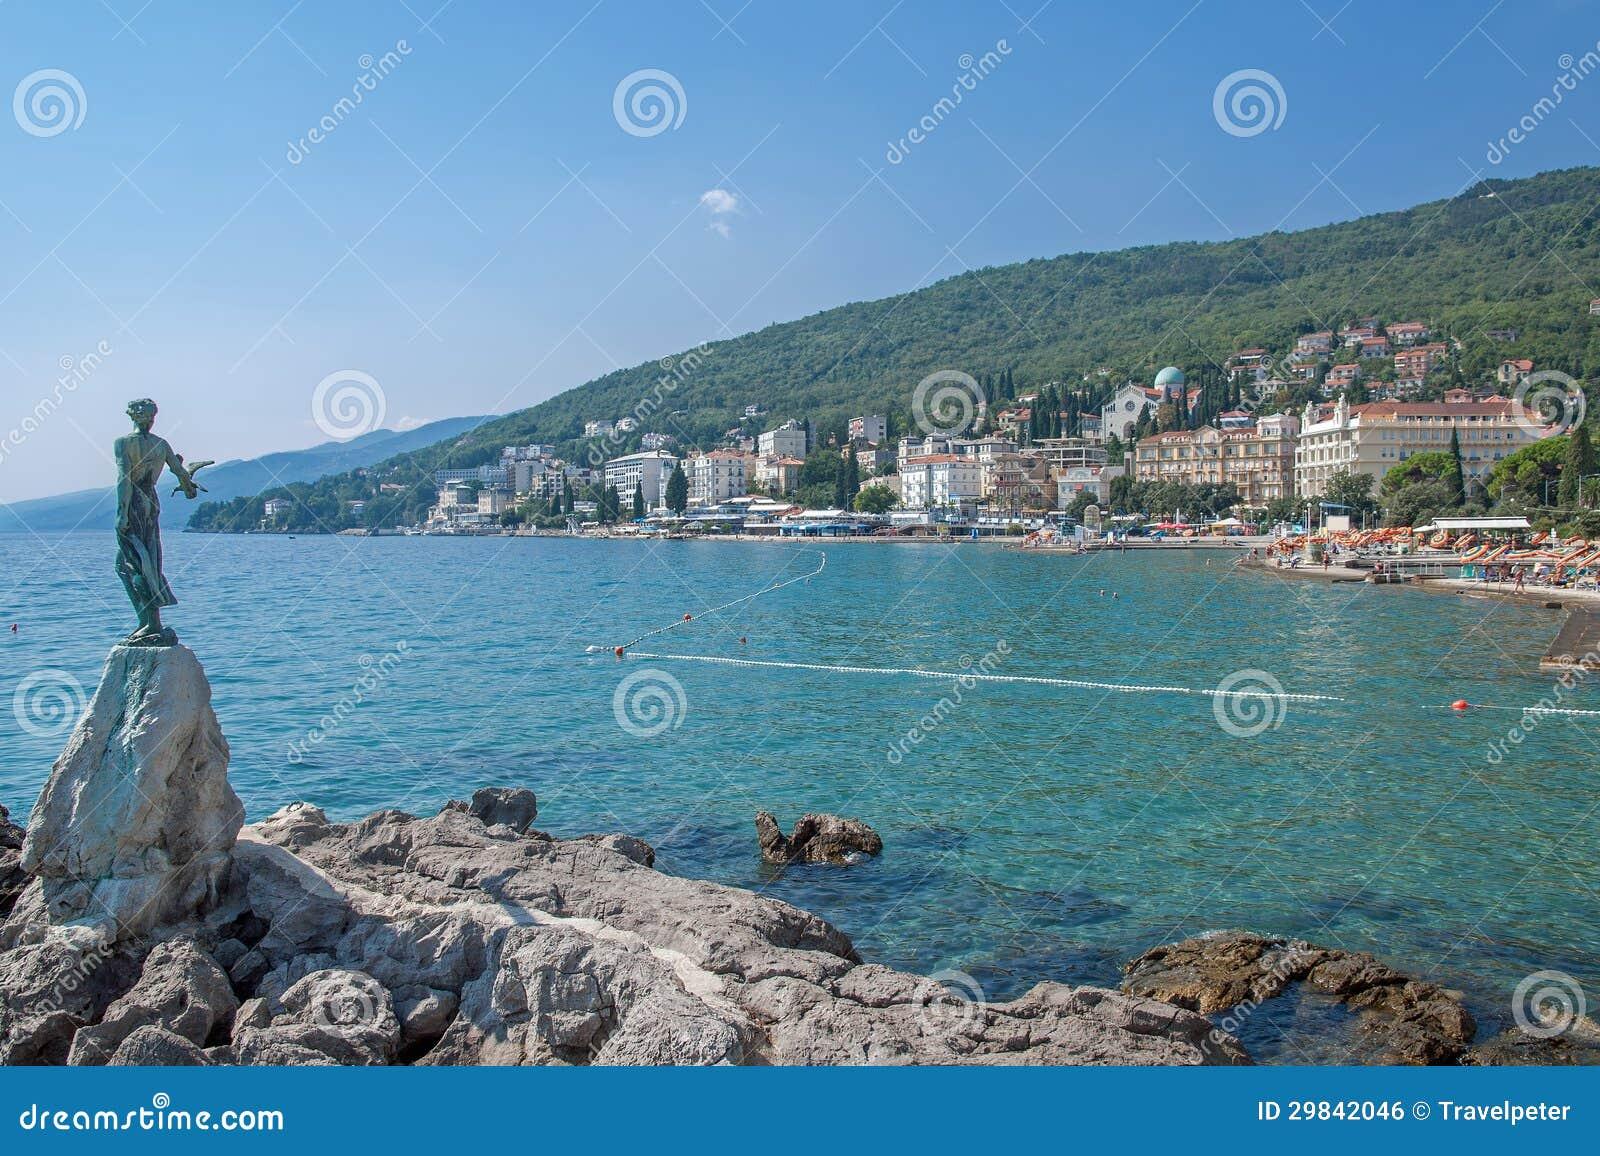 Opatija, mar de adriático, Istria, Croatia